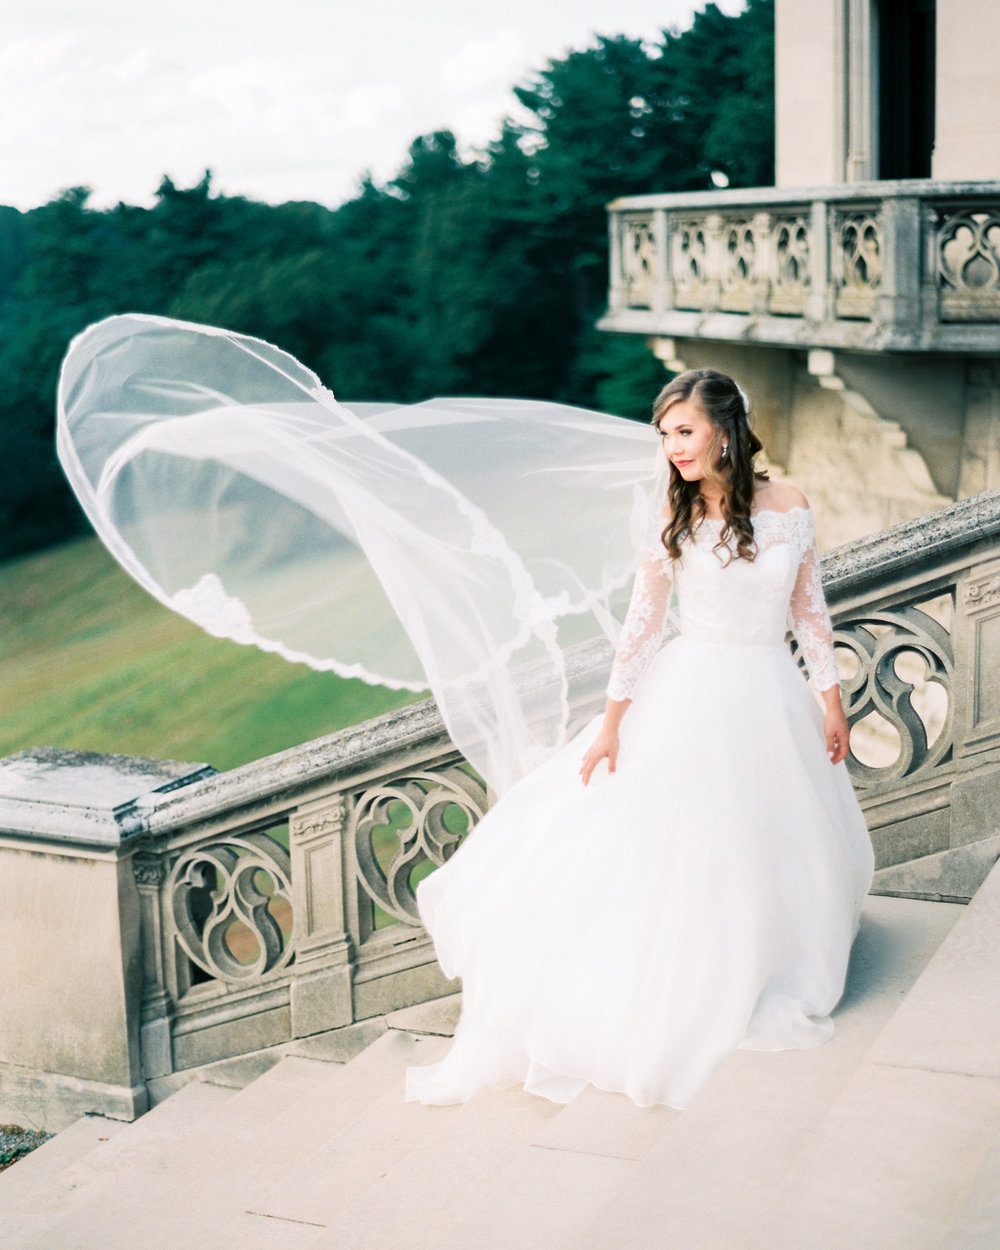 timeless-classy-cathedral-veil-bridal-session-biltmore-north-carolina-wedding-film-photographer-1.jpg